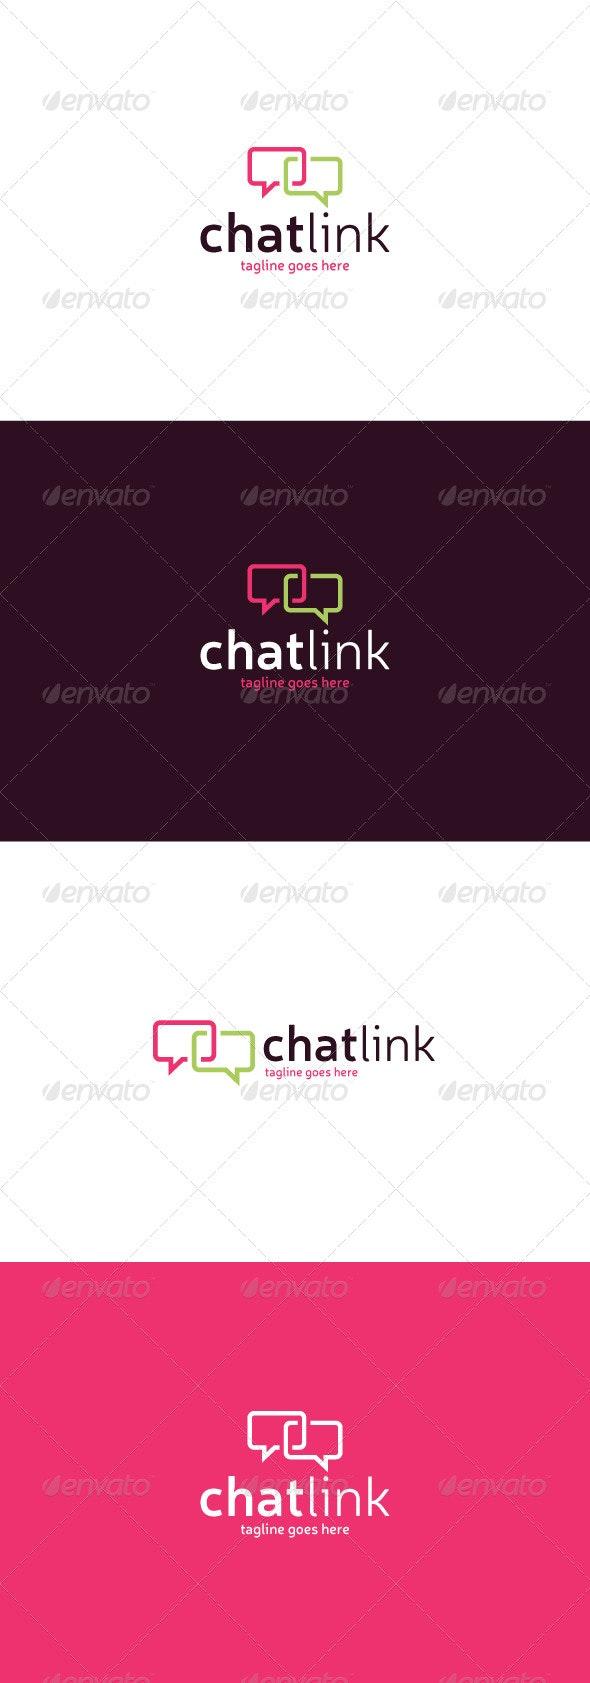 Chat Link Logo - Symbols Logo Templates